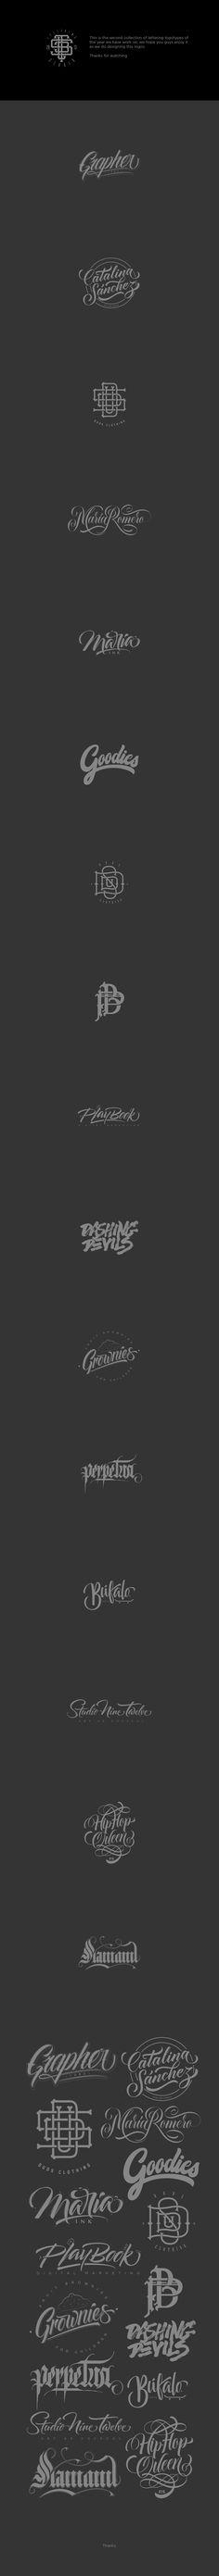 Handlettering Logotypes Vol. 2 on Behance